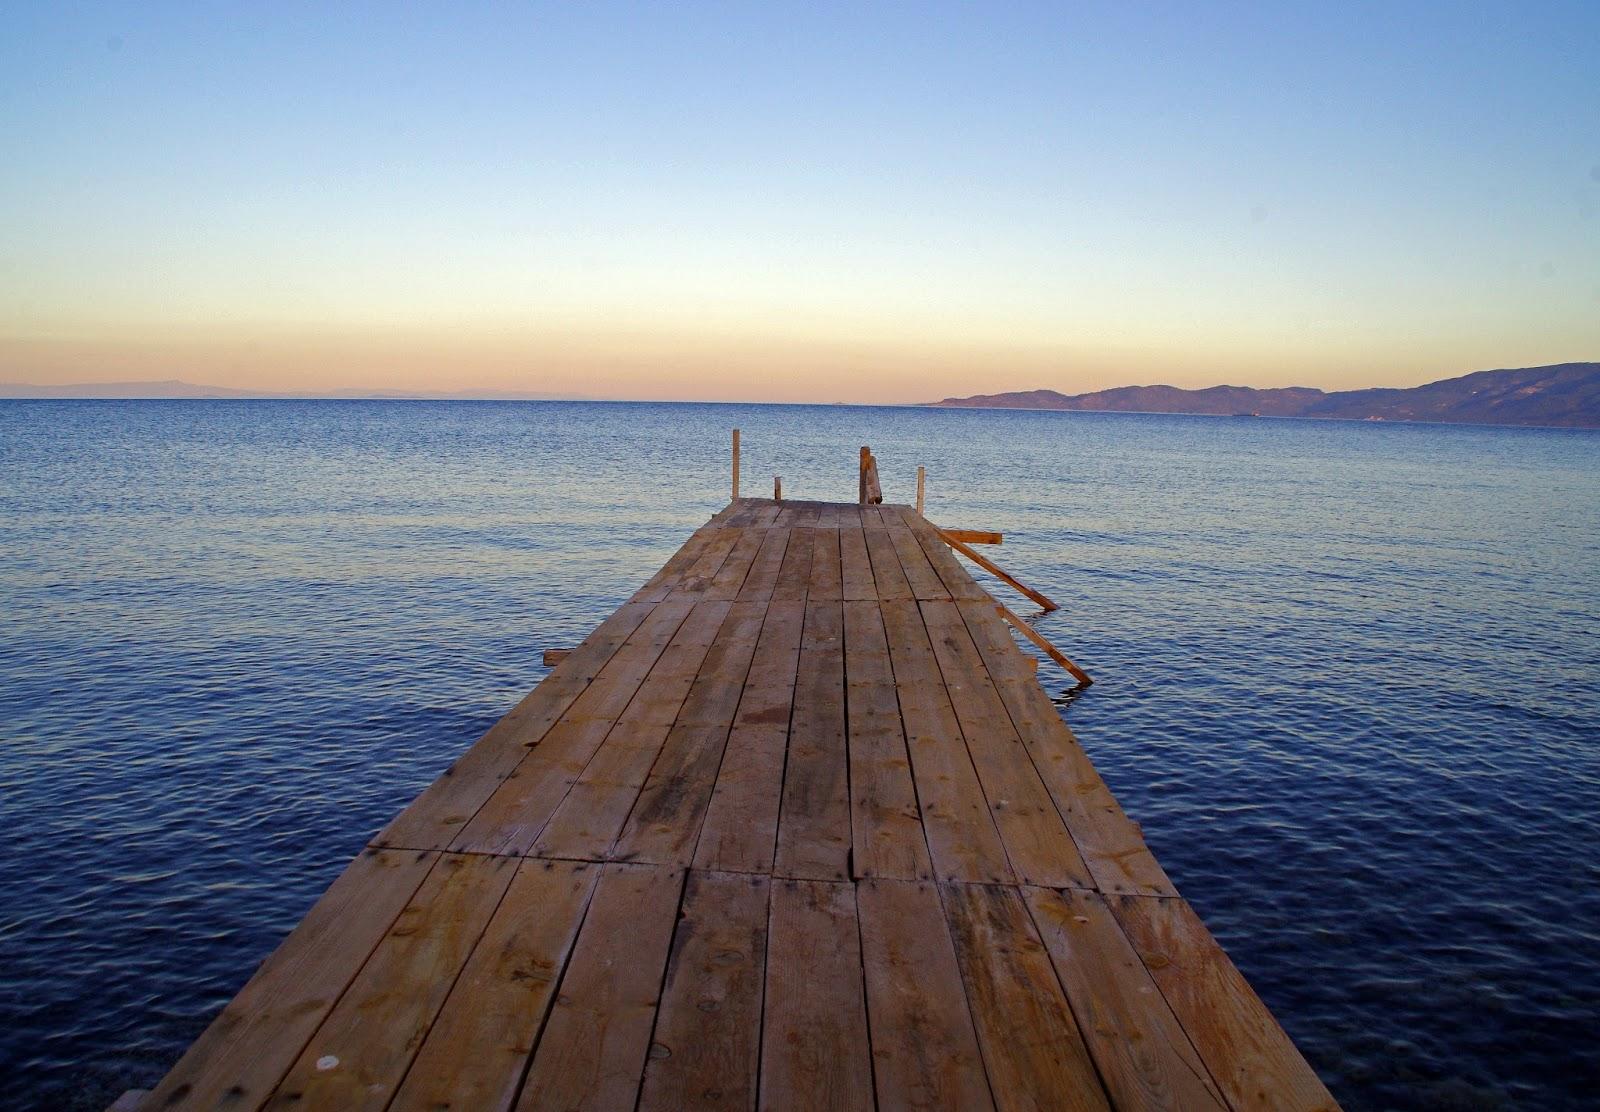 Beautiful sunset over Pier in Assos Turkey